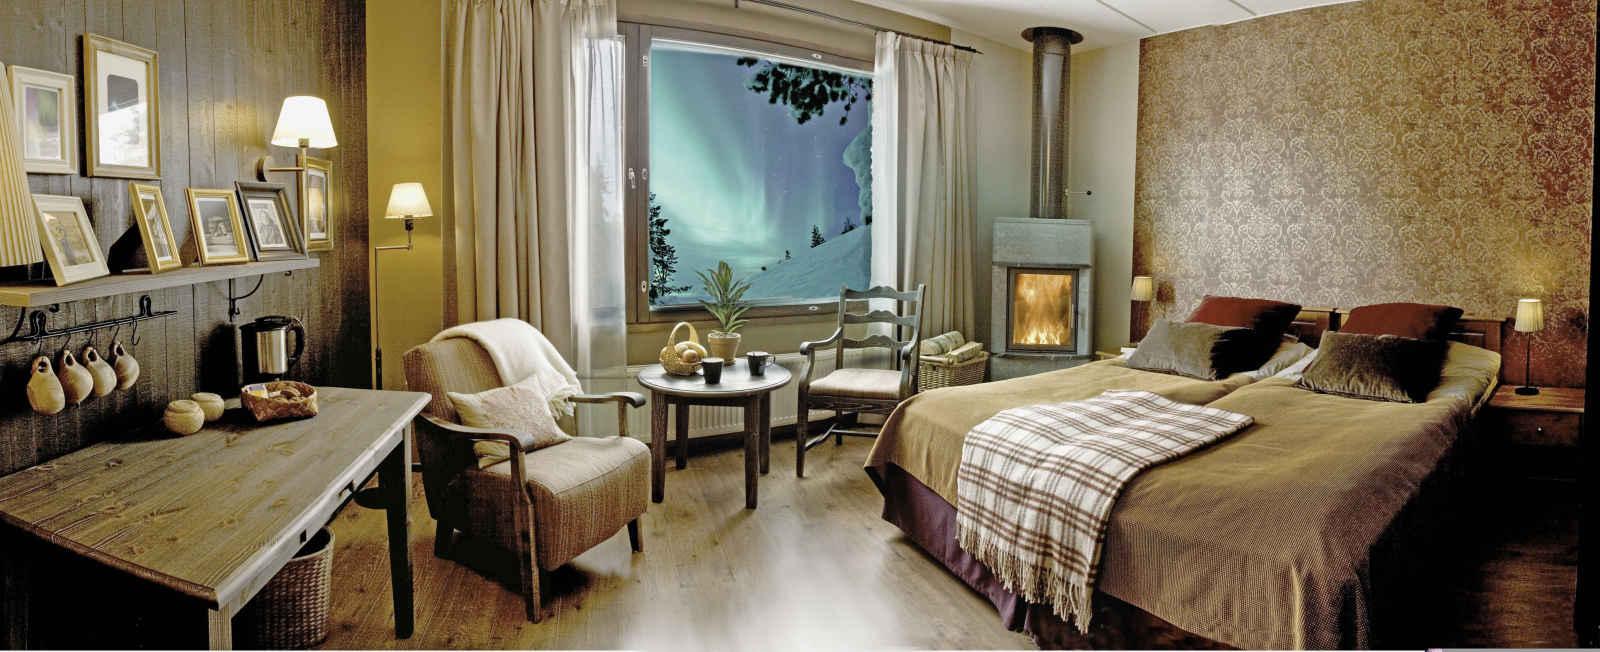 Santa's Hotel Aurora 4 jours / 3 nuits